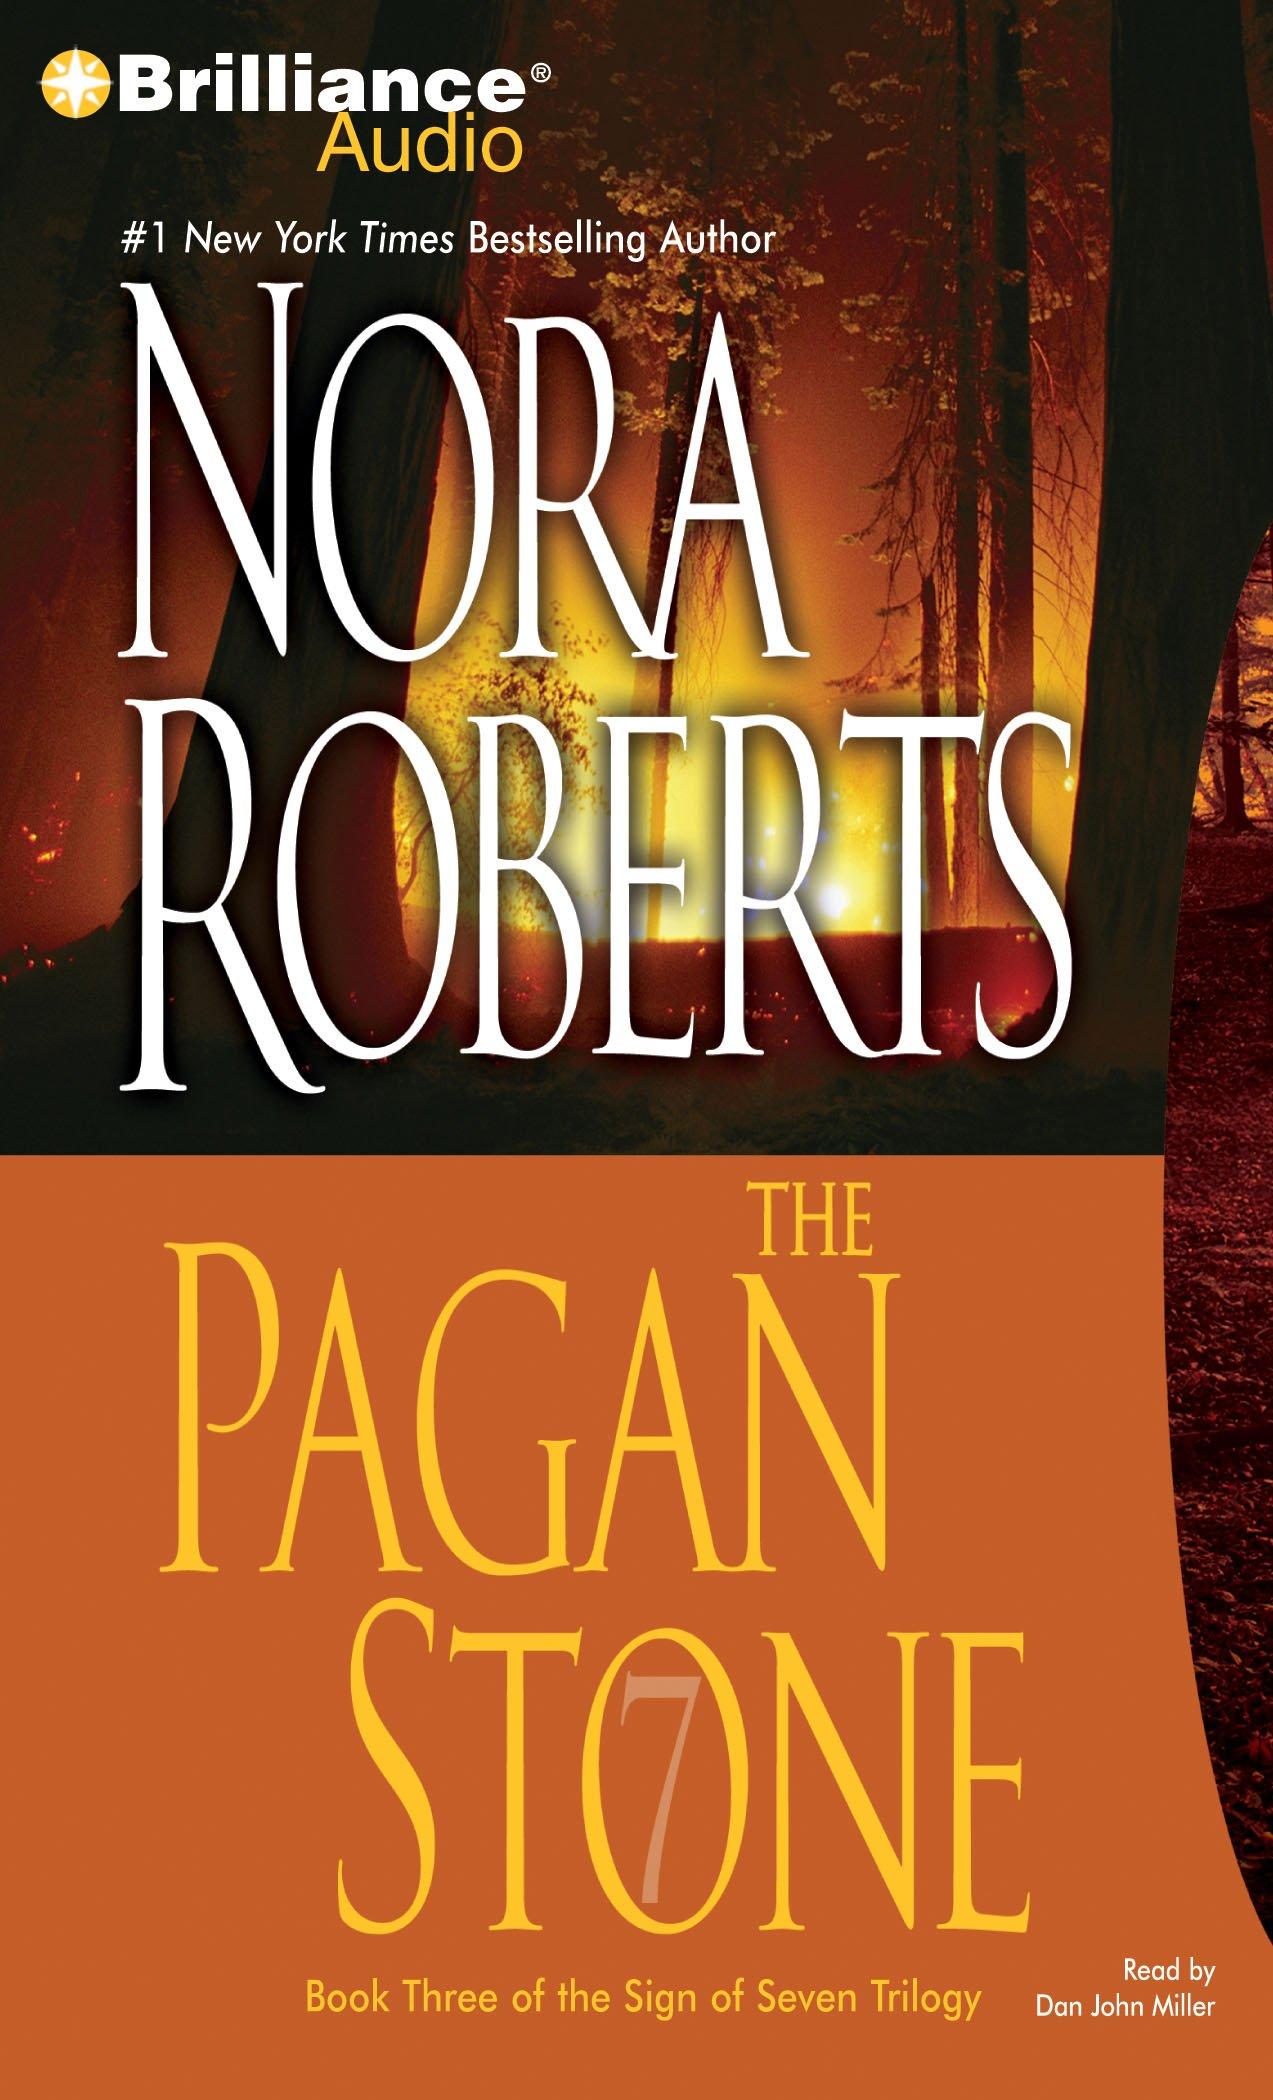 The Pagan Stone (Sign of Seven Trilogy): Amazon.co.uk: Nora Roberts, Dan  John Miller: 9781423337911: Books